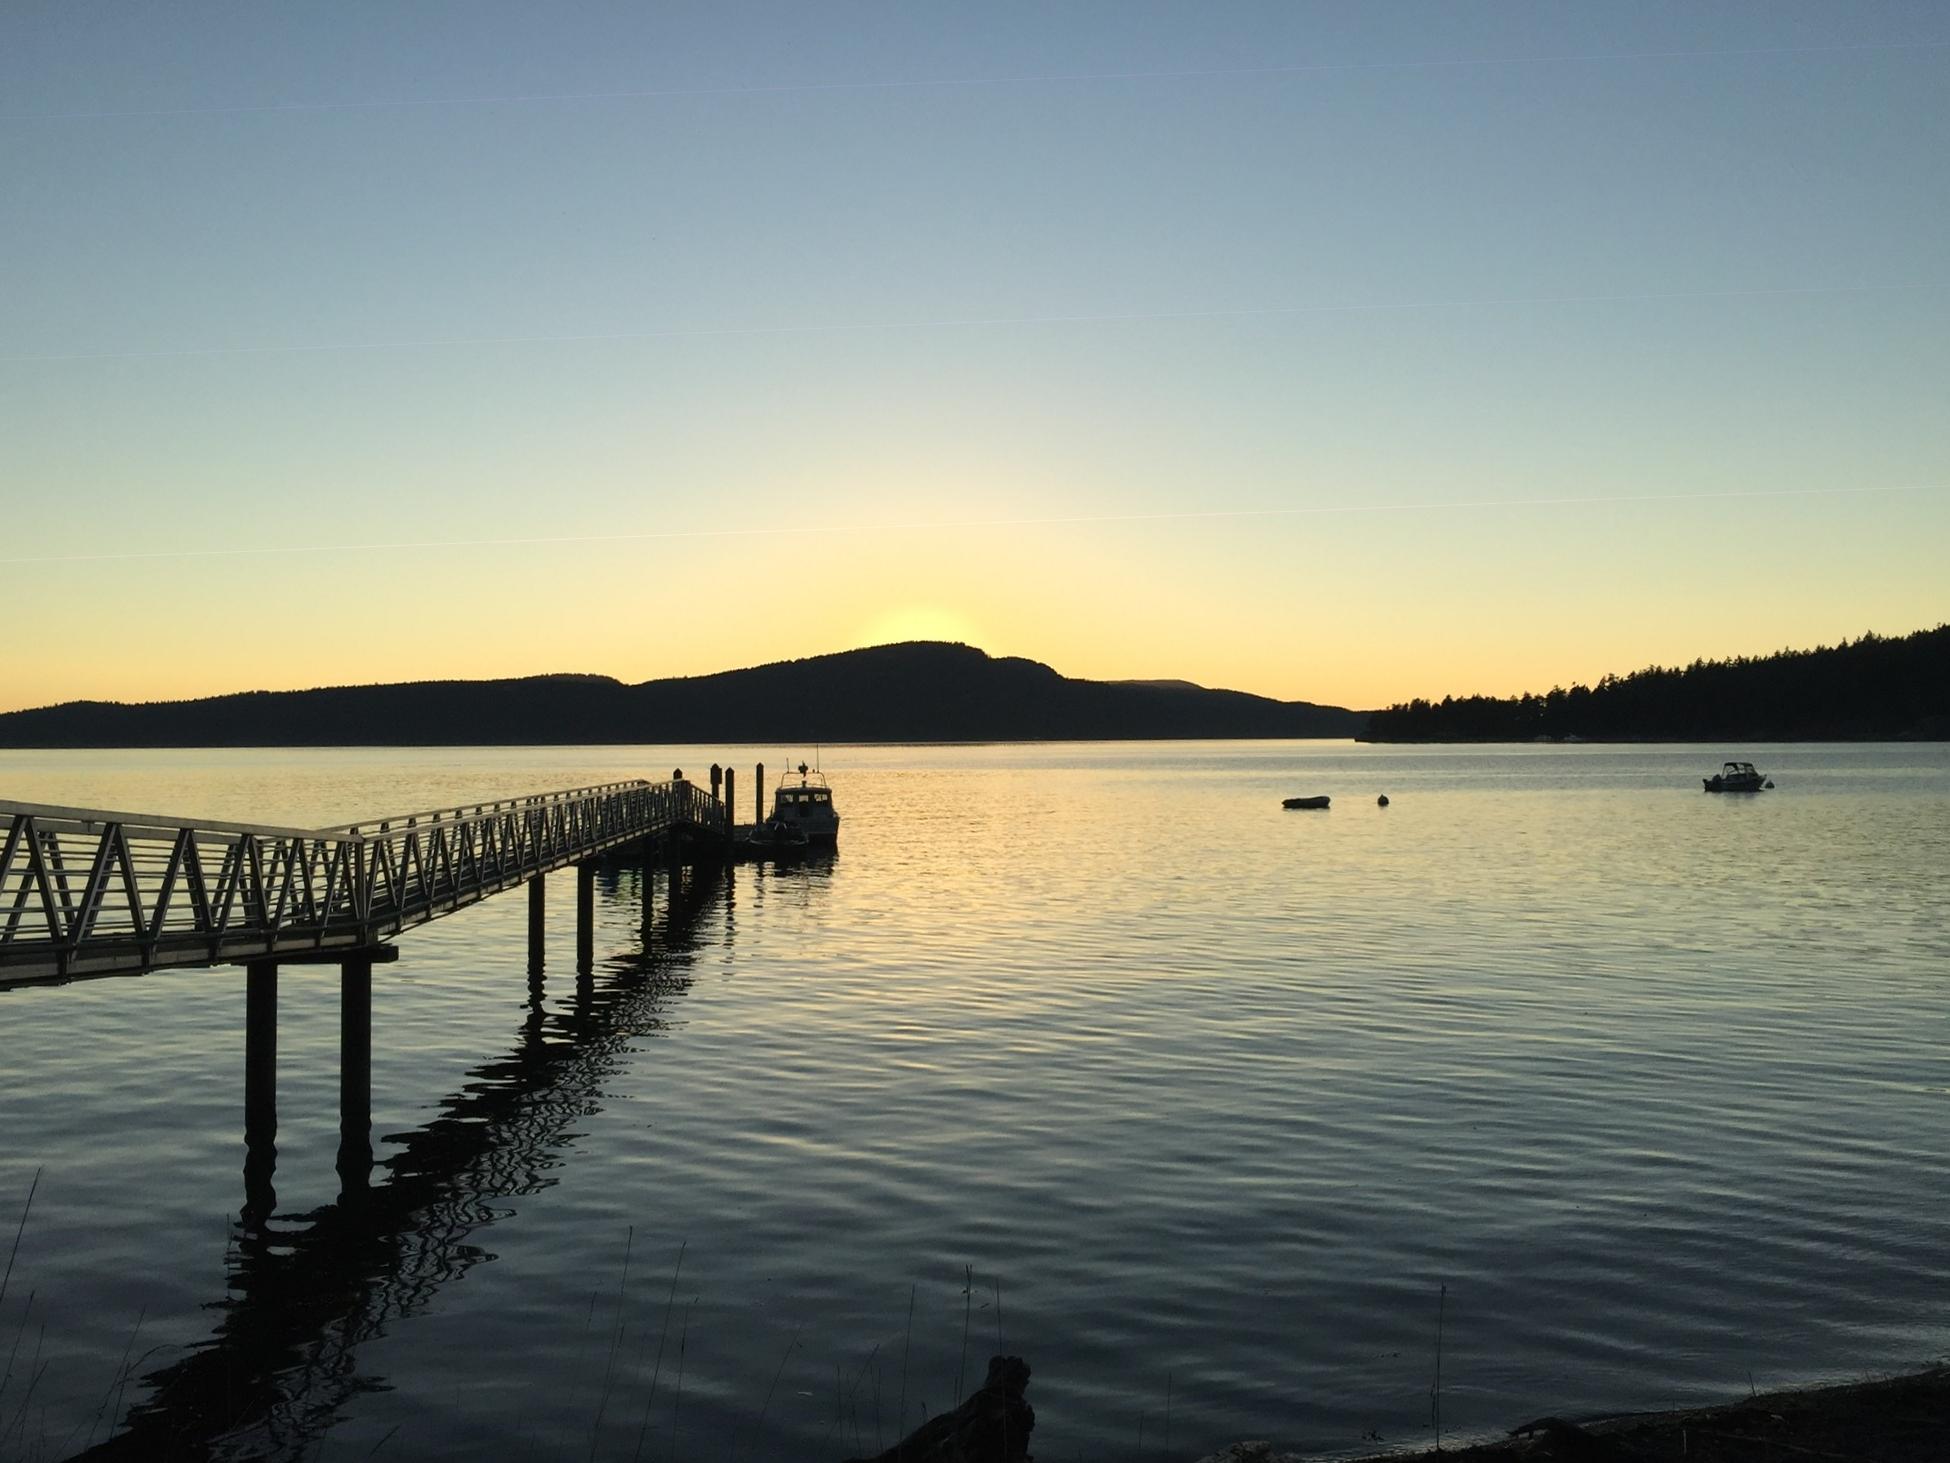 Obstruction Island, Washington